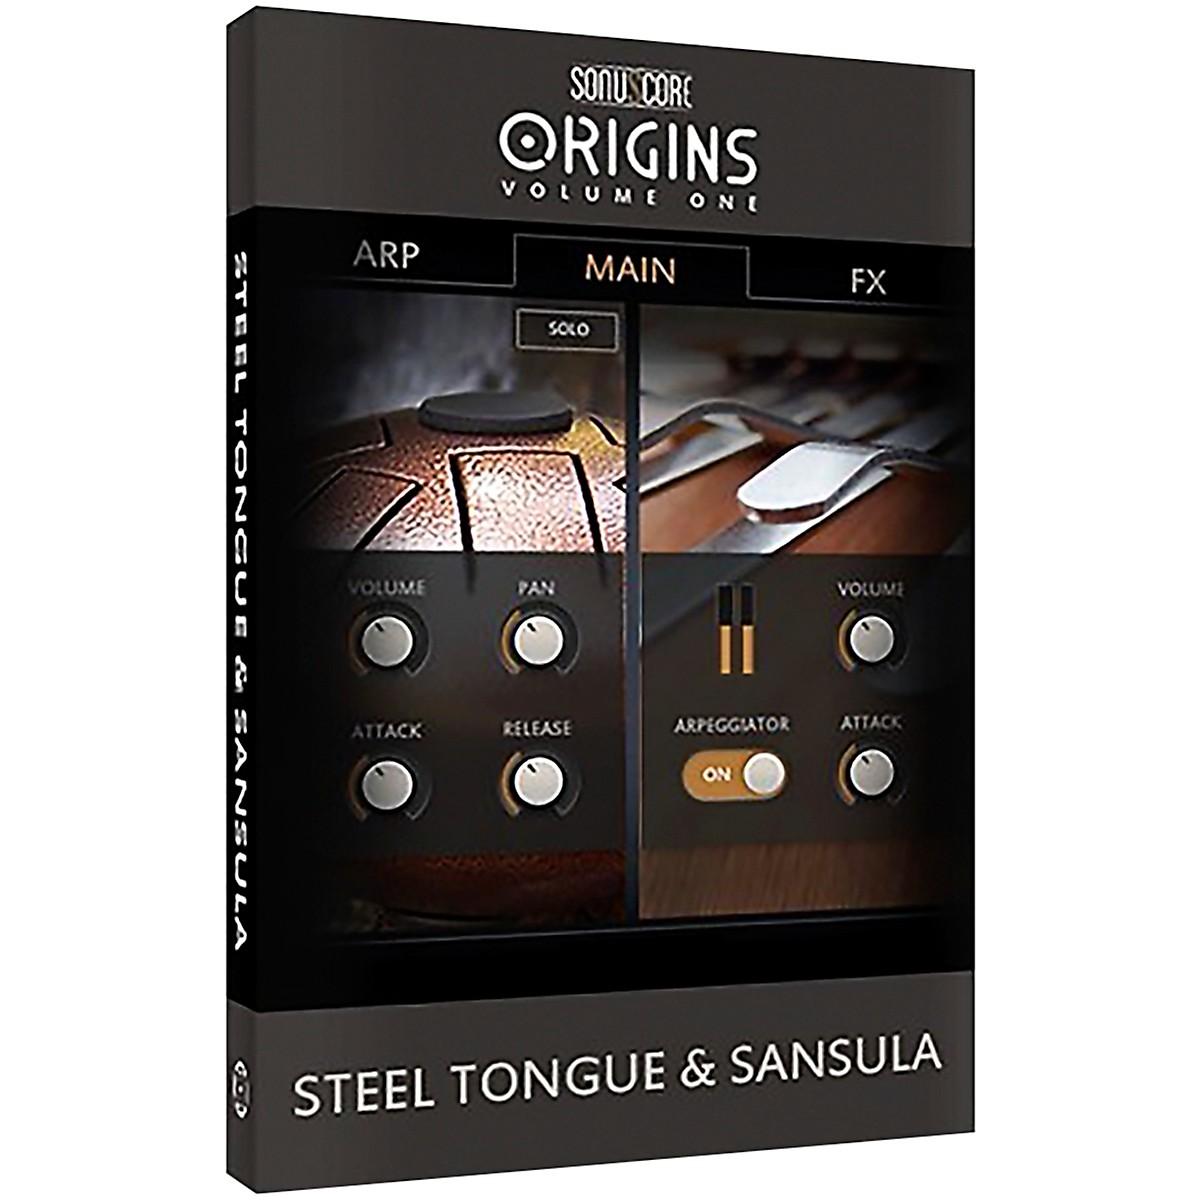 Sonuscore Origins Series Vol. 1 Steel Tongue & Sansula